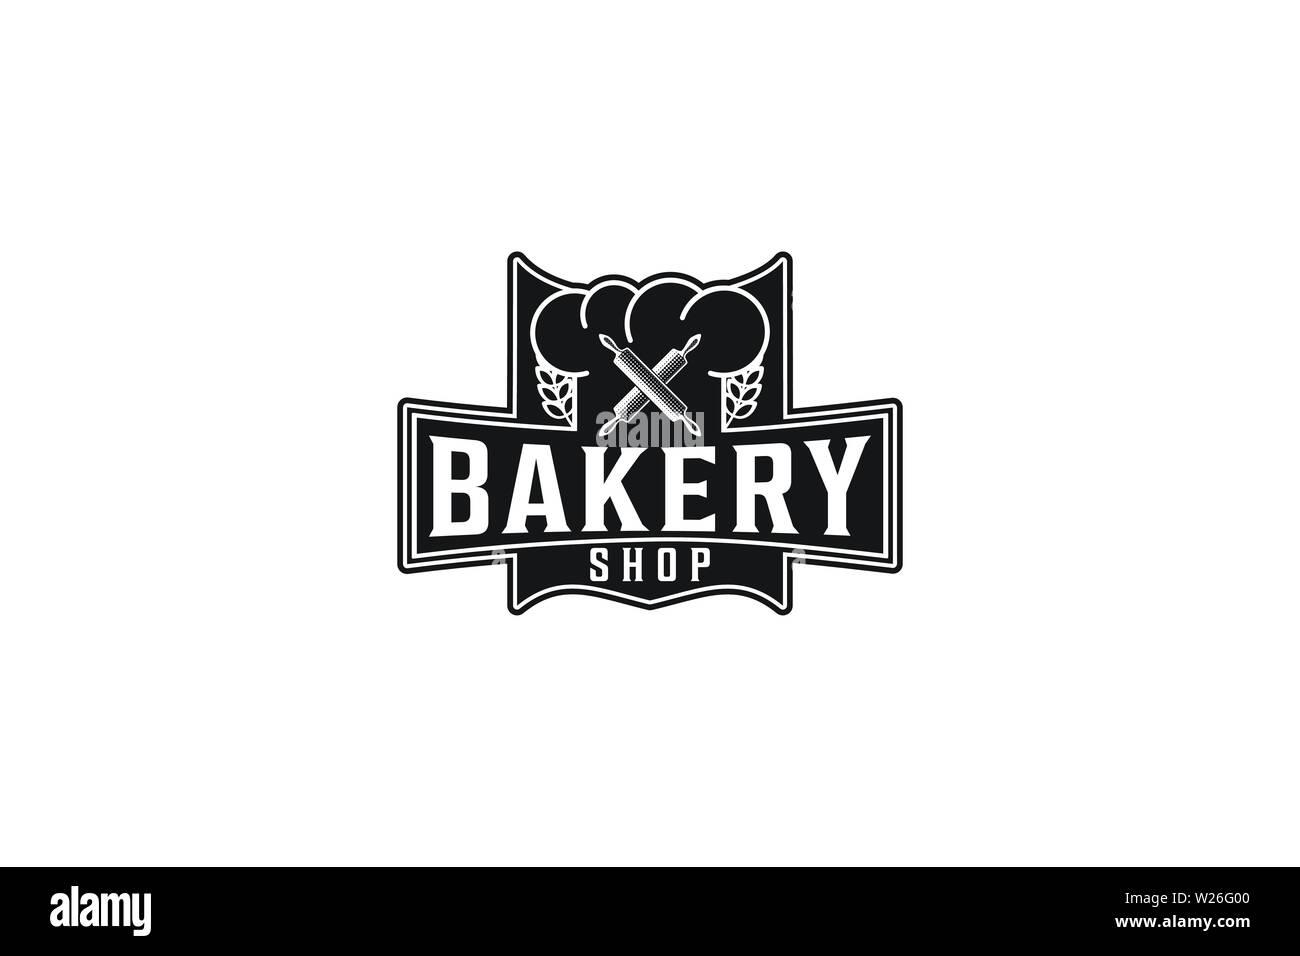 Rolling Pin gekreuzt, Vintage Bäckerei Logo Designs